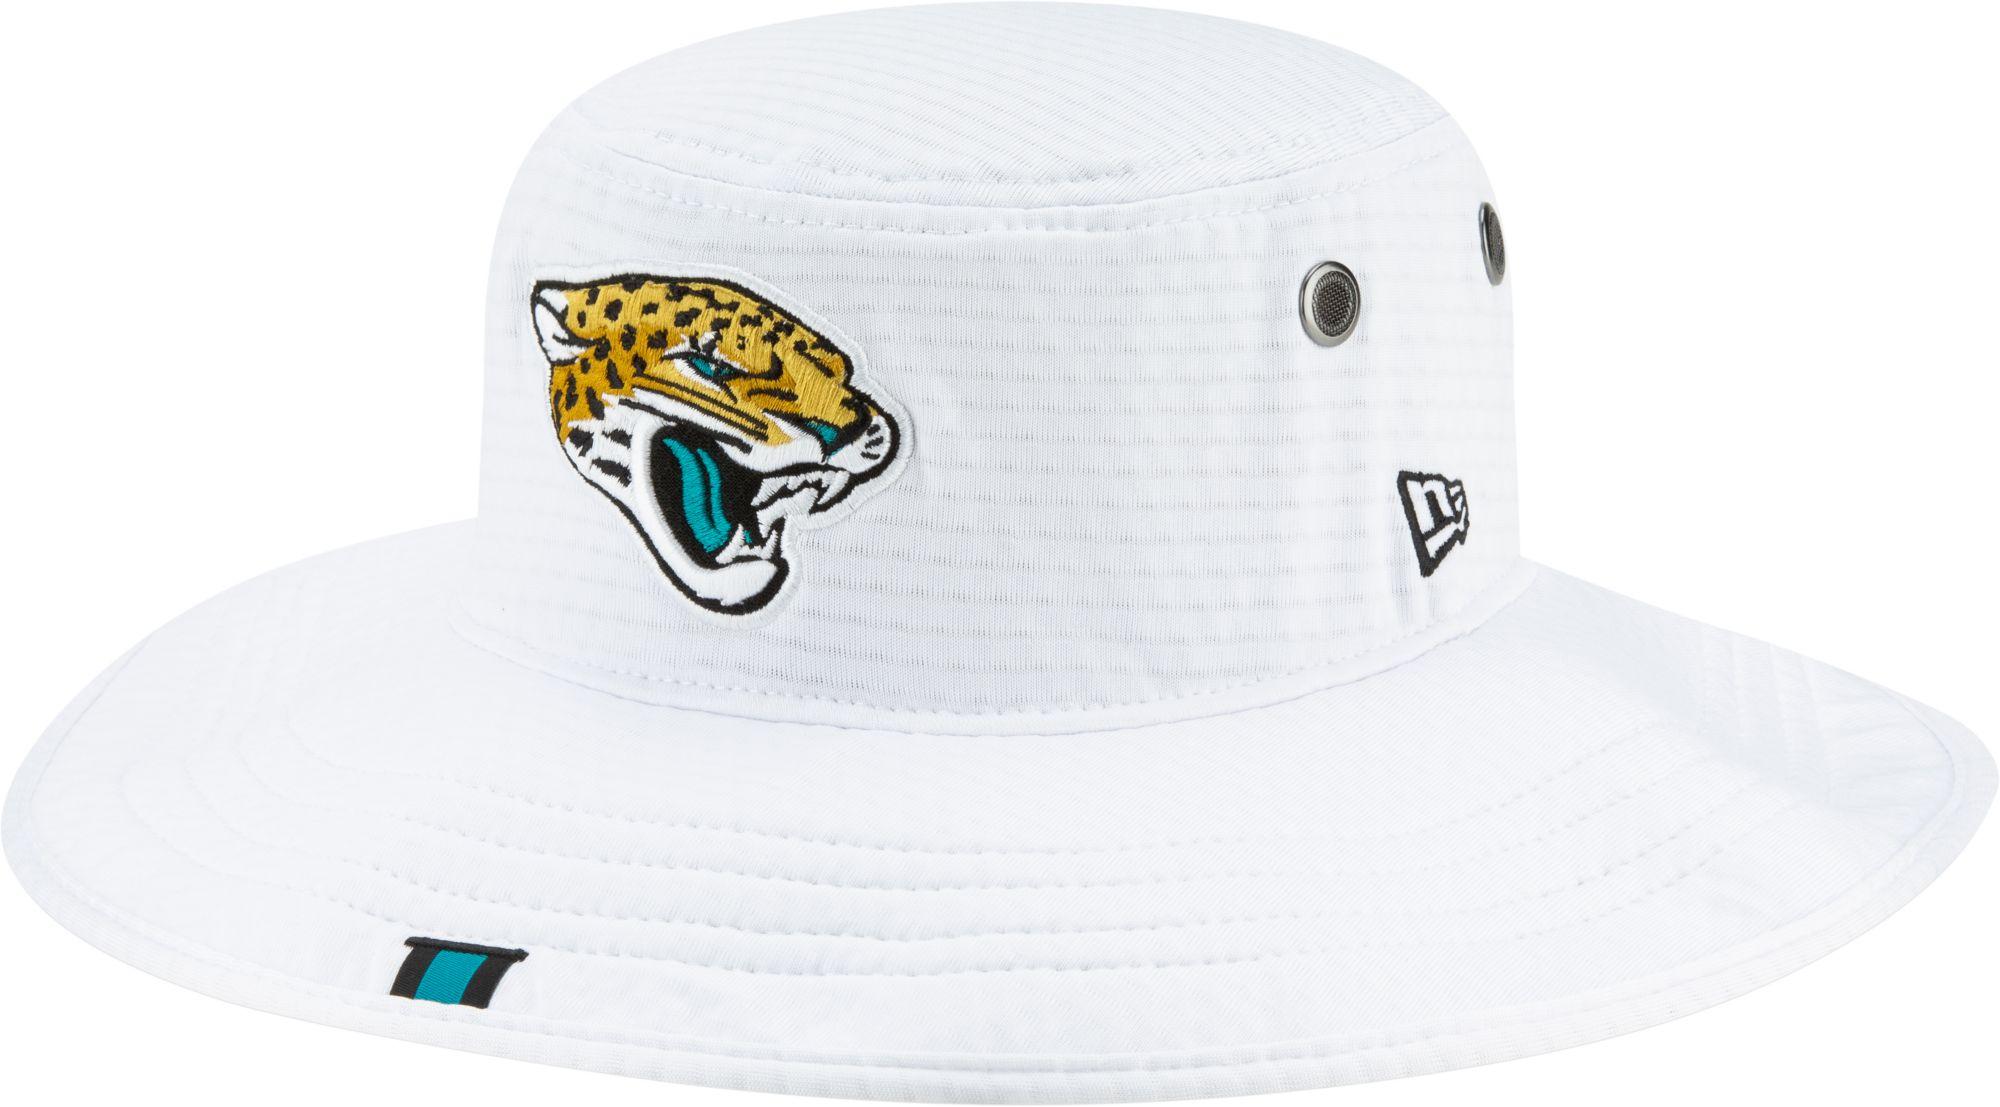 0f941cb0 New Era Men's Jacksonville Jaguars Sideline Training Camp Panama White  Bucket Hat